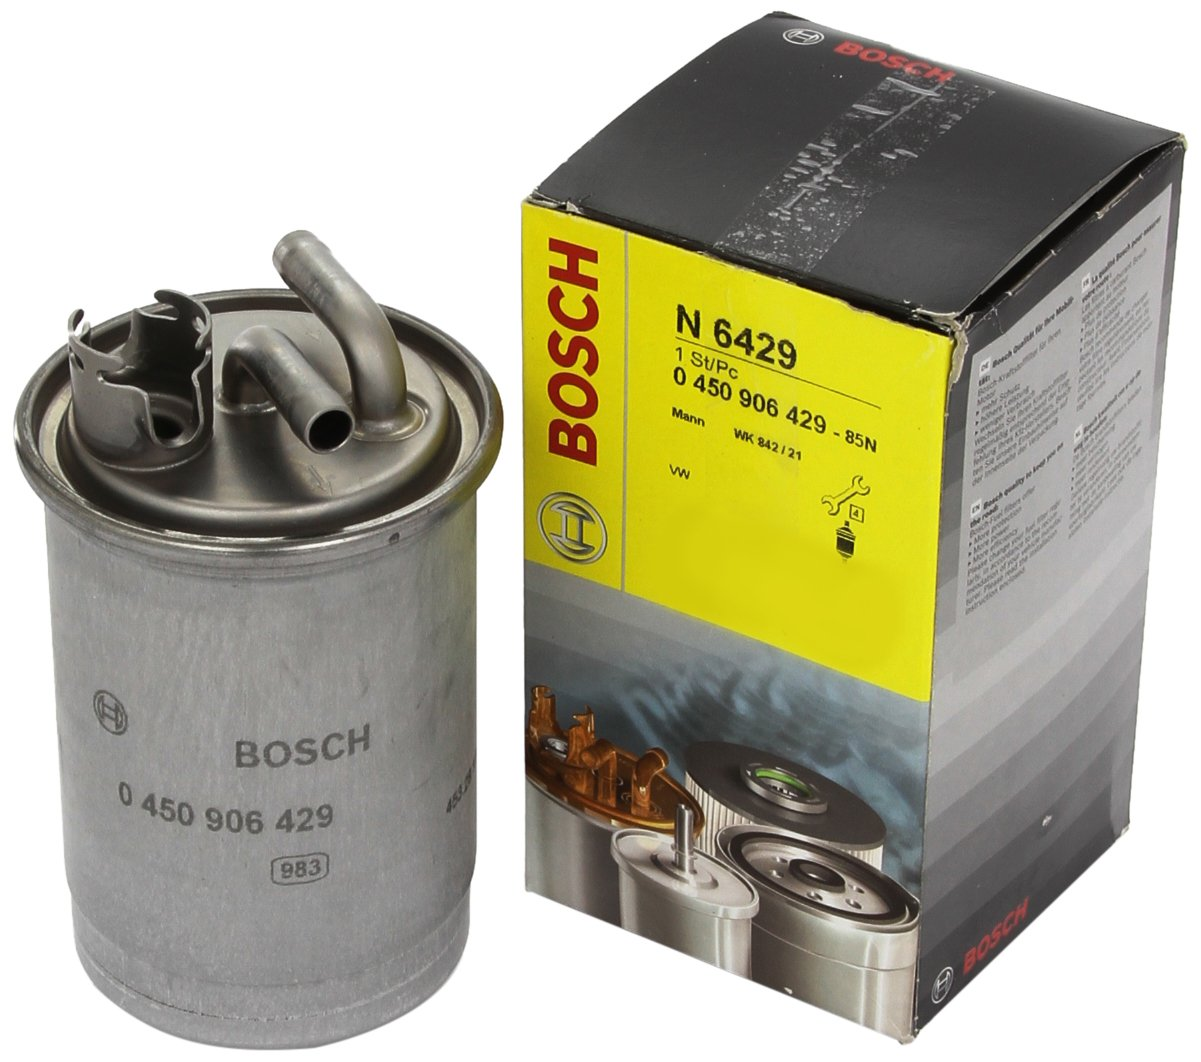 Bosch 0 450 906 429 Filtro Combustible